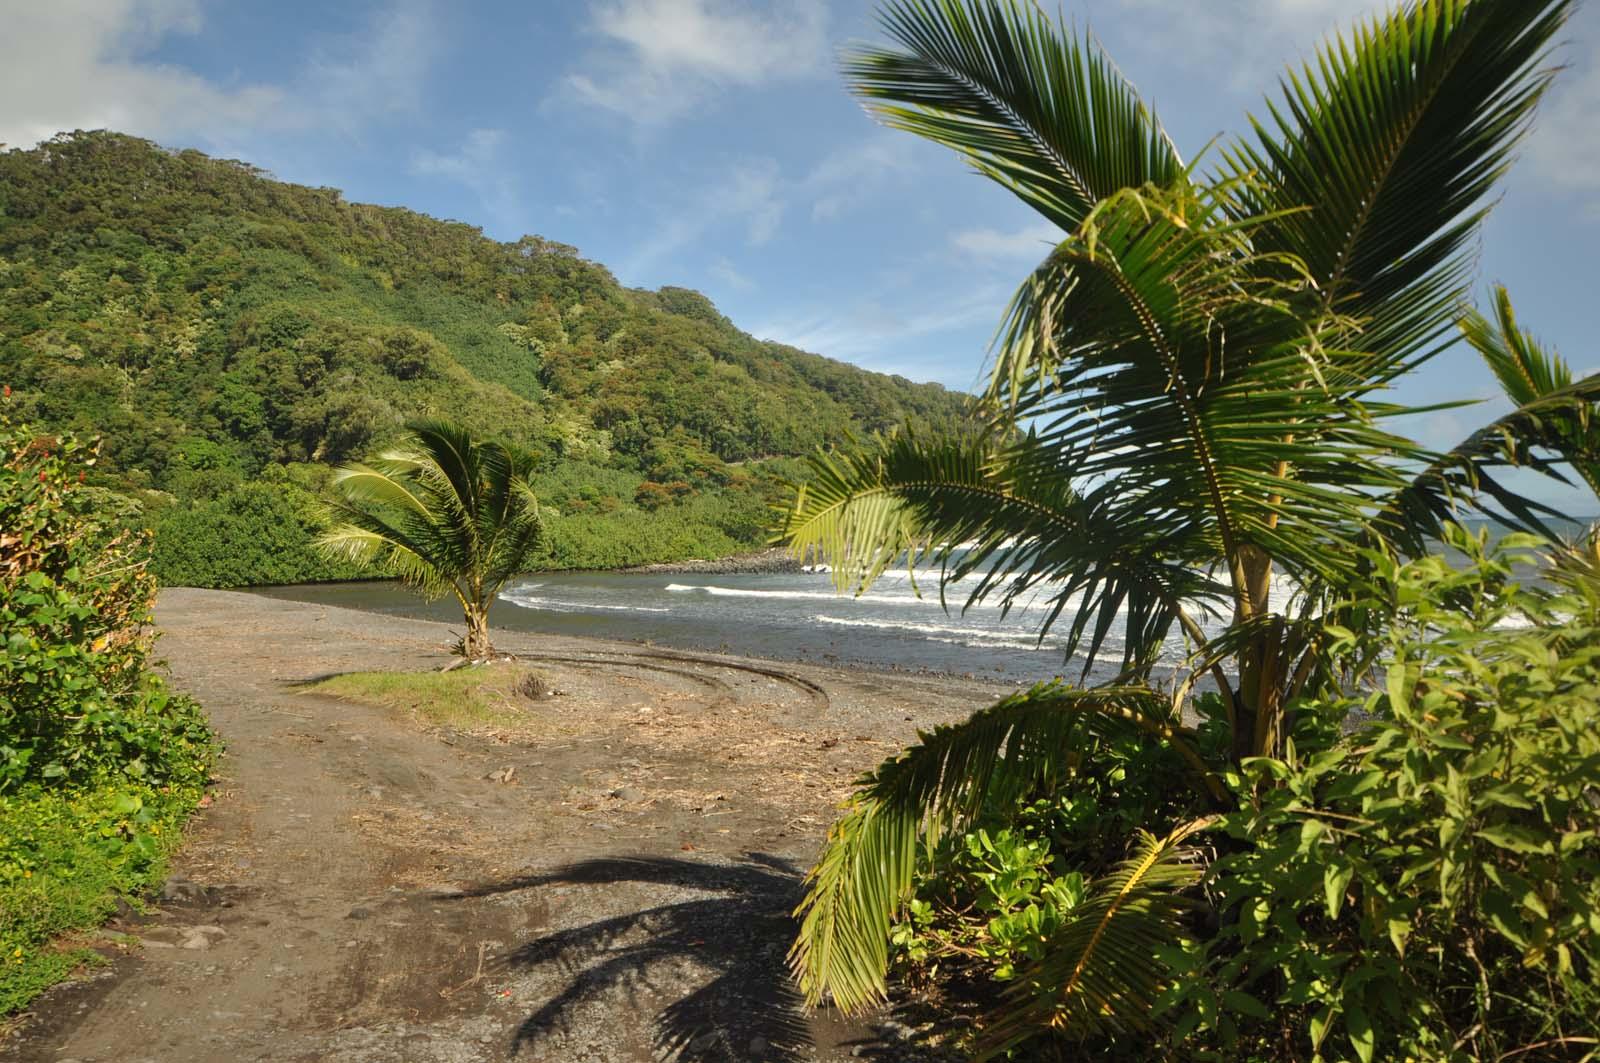 123_maui_hawaii_island